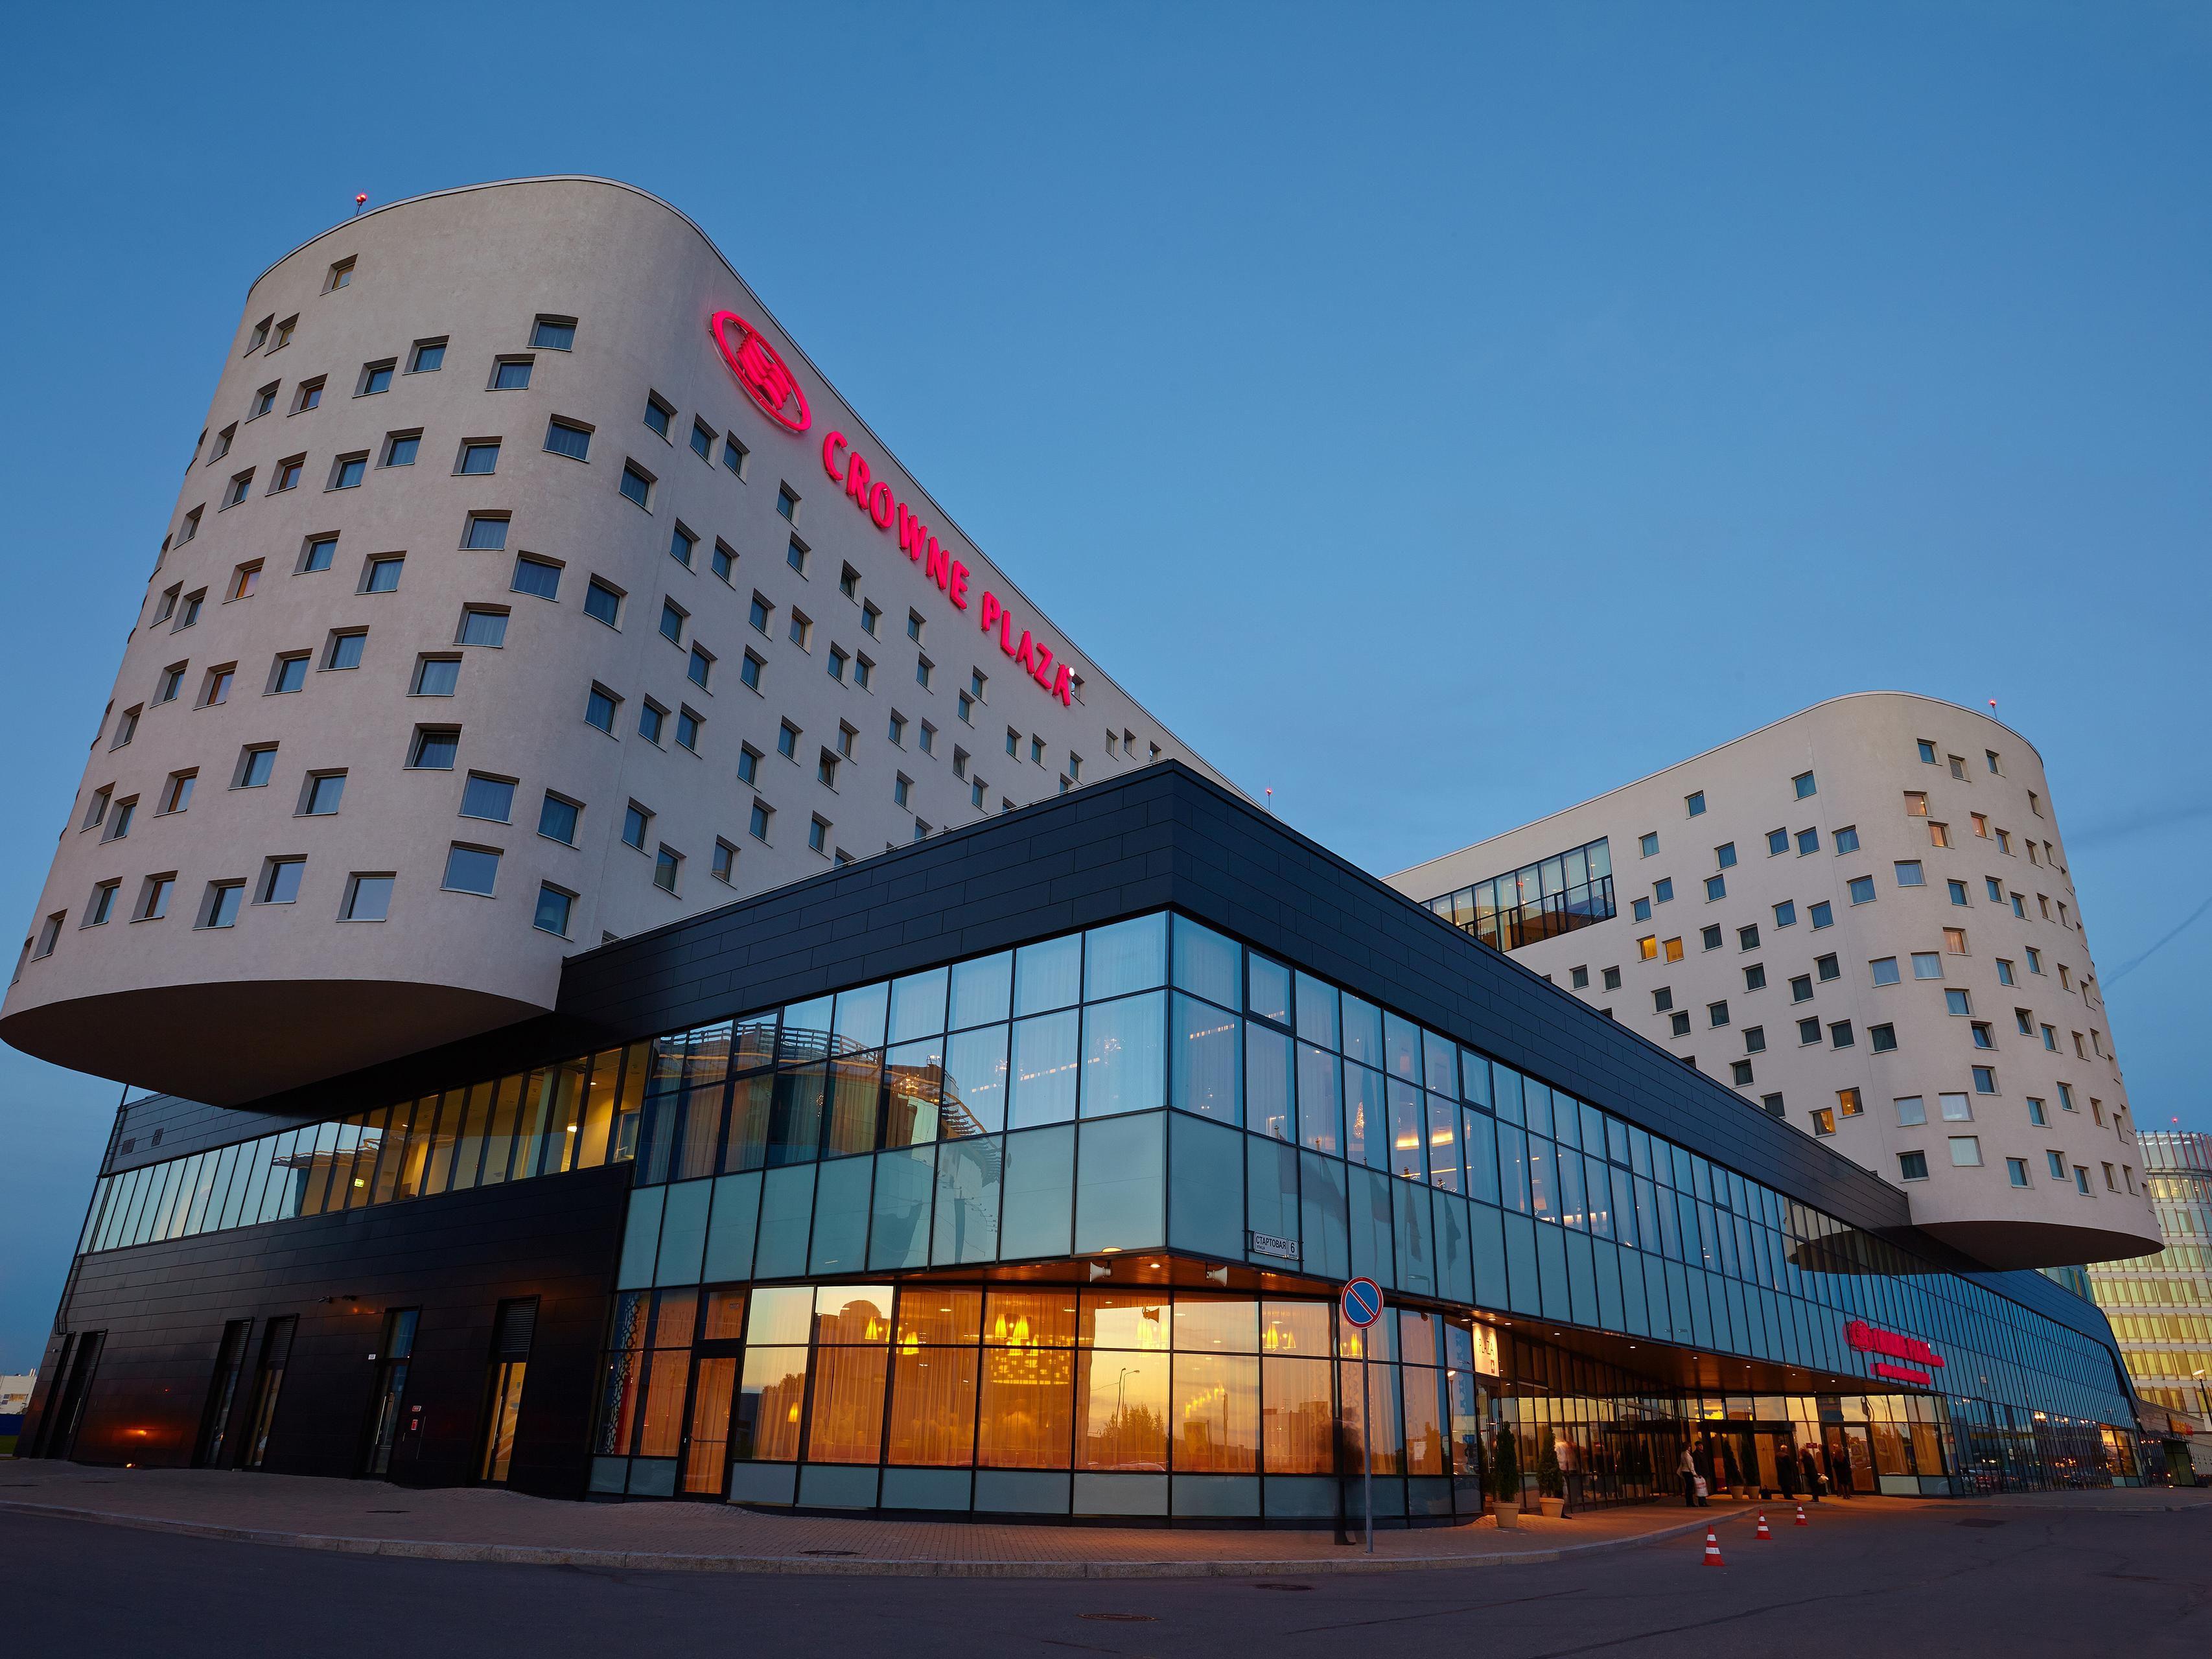 st petersburgのホテルを検索 russian federation st petersburgに